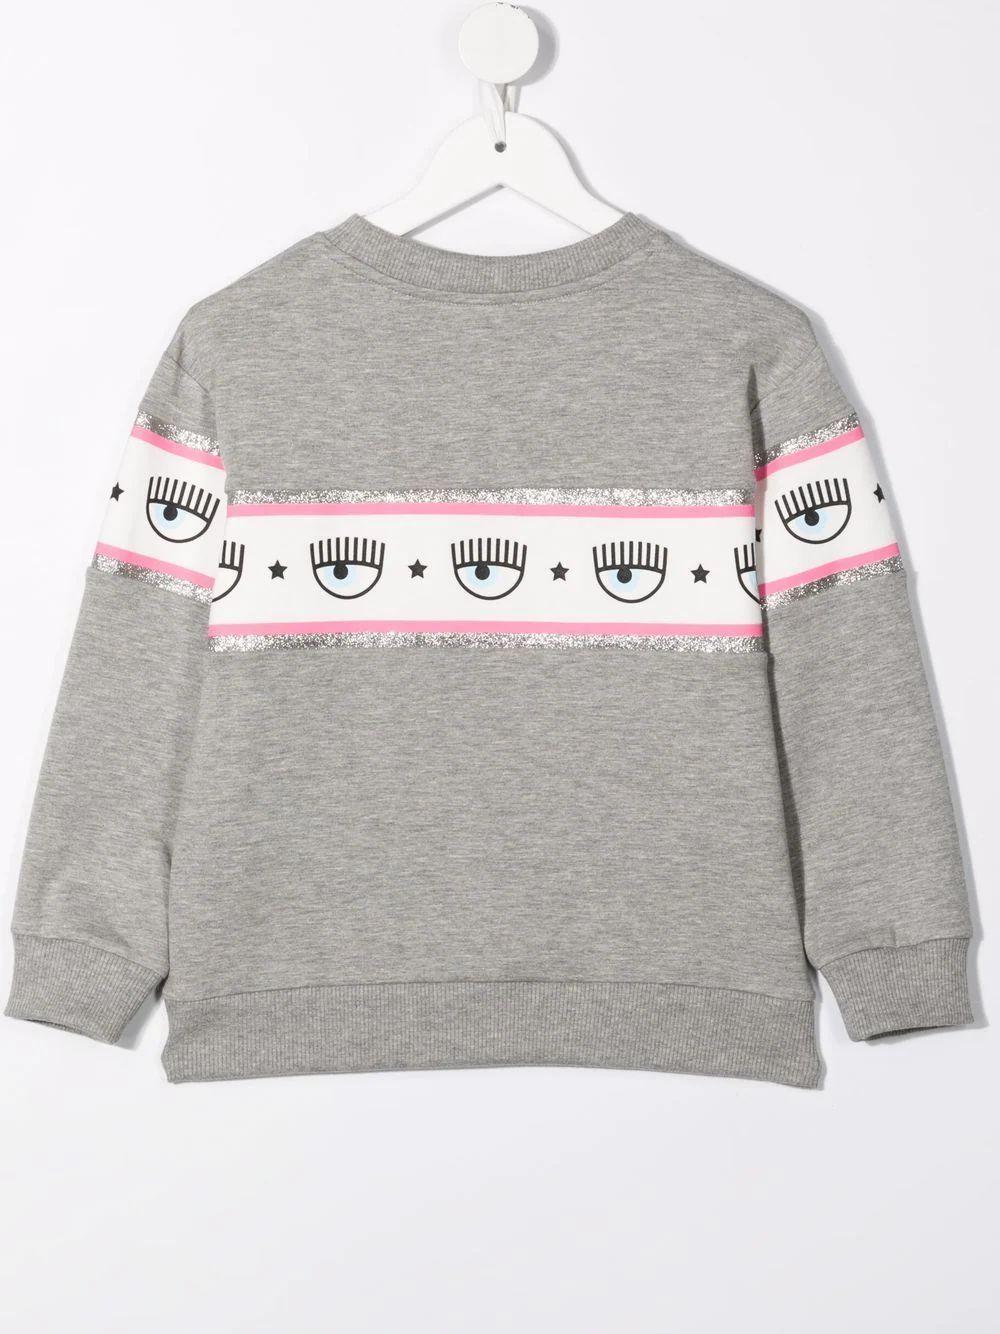 CHIARA FERRAGNI | Sweatshirt | 59861580720032